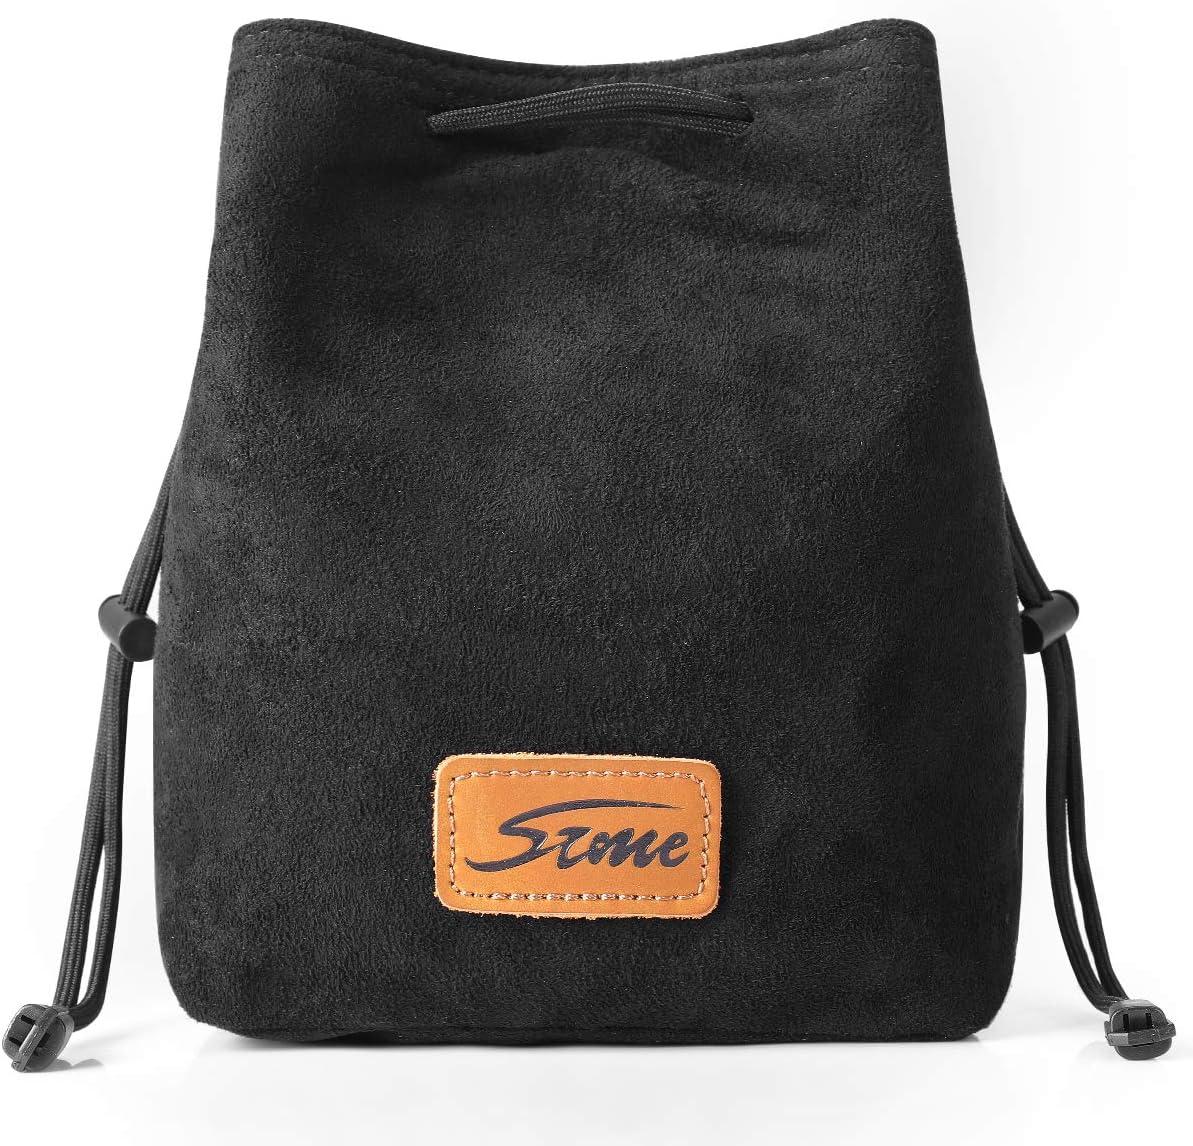 S-ZONE Soft Camera Bag DSLR Insert Handbag Drawstring Lens Case Compatible with Canon Nikon Sony